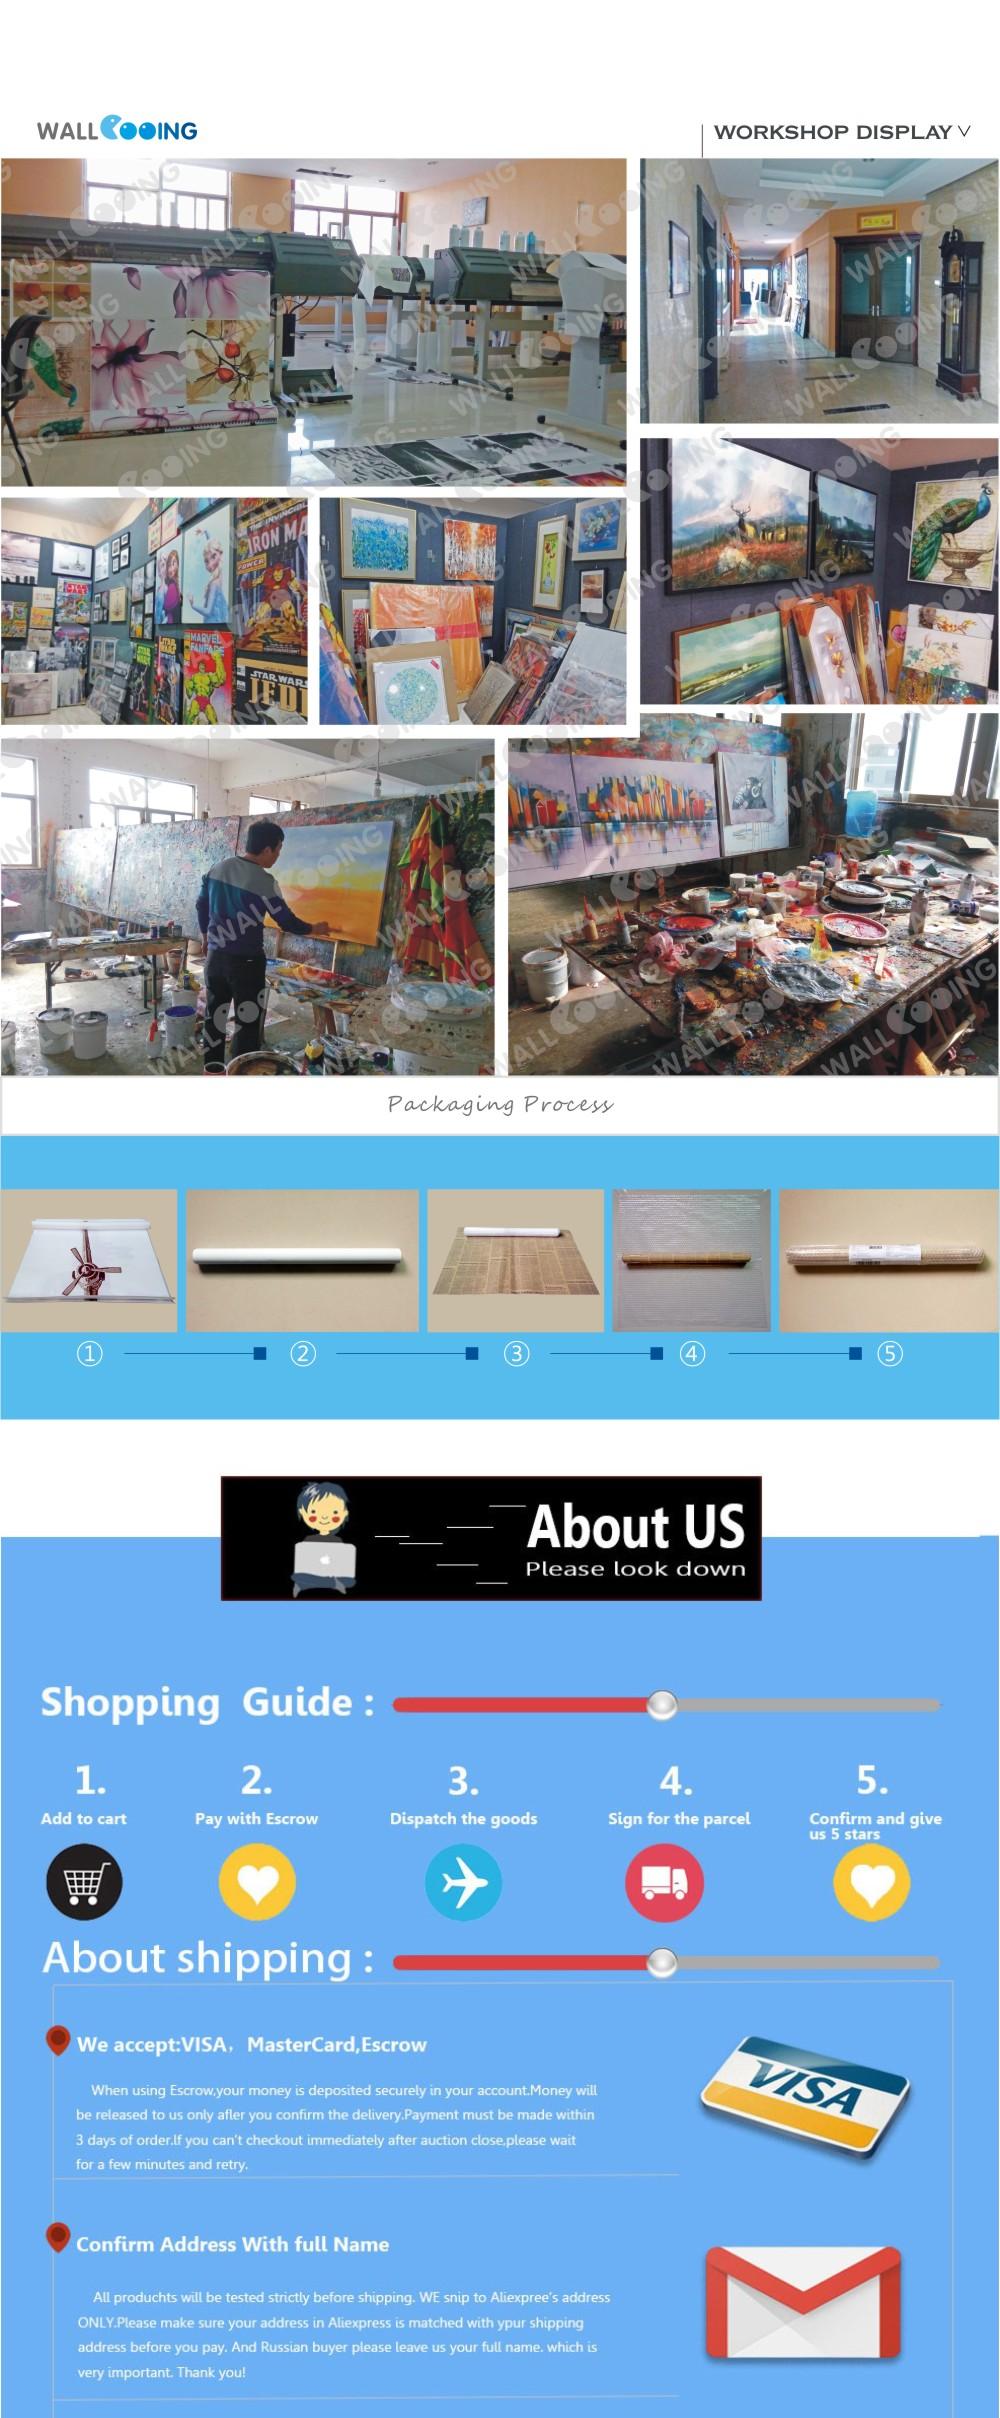 4-3-Production workshop and shopping process description